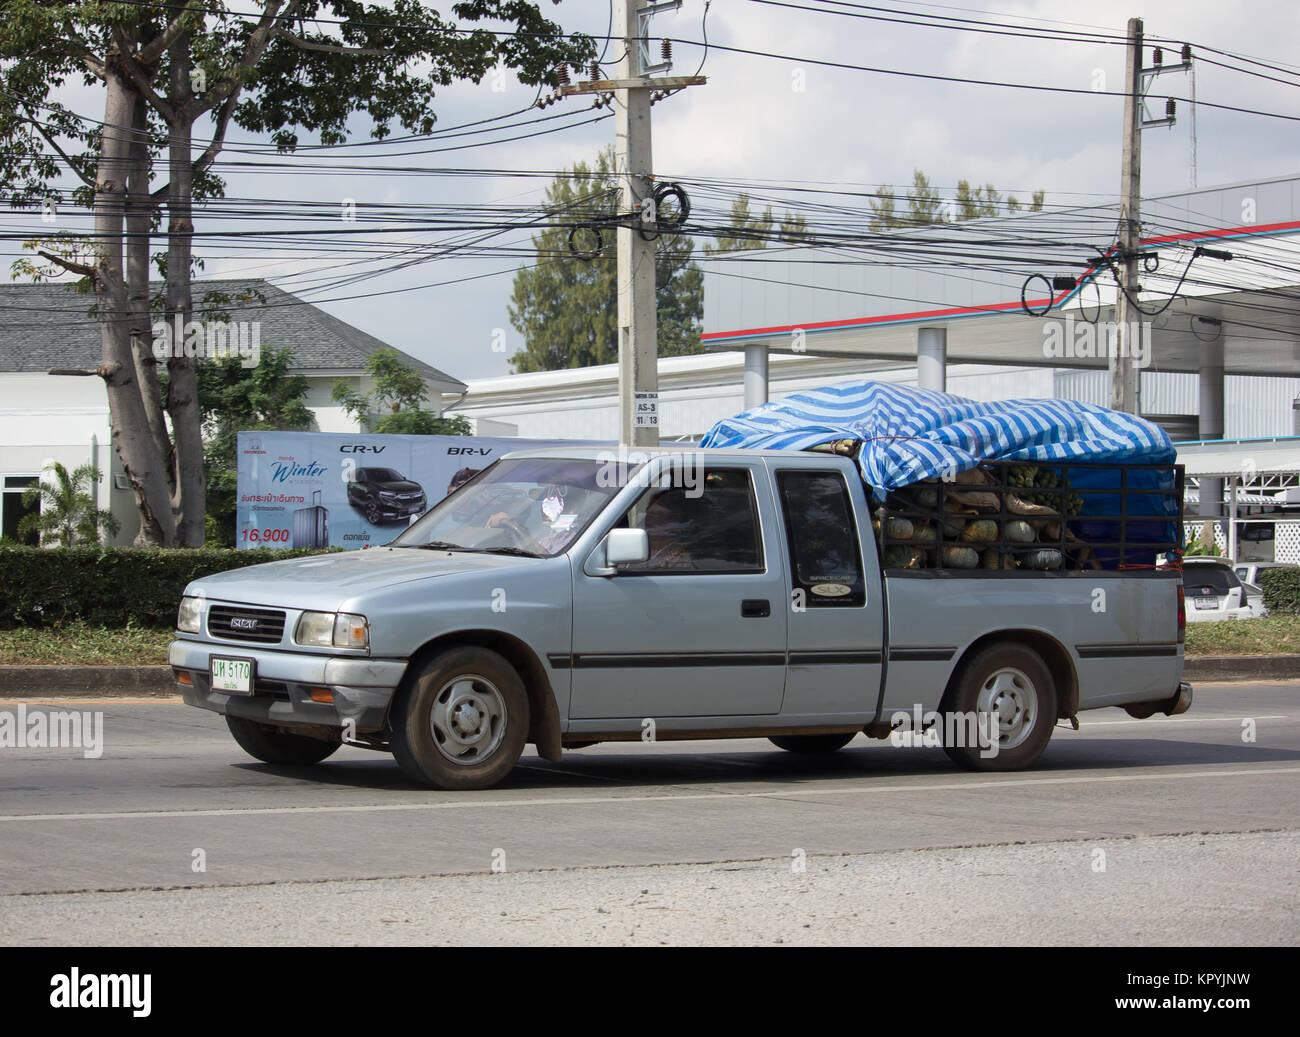 CHIANG MAI, THAILAND - 28. NOVEMBER 2017: Private alten Isuzu Pickup Truck. Auf der straße Nr. 1001 8 km von Chiang Mai City. Stockfoto